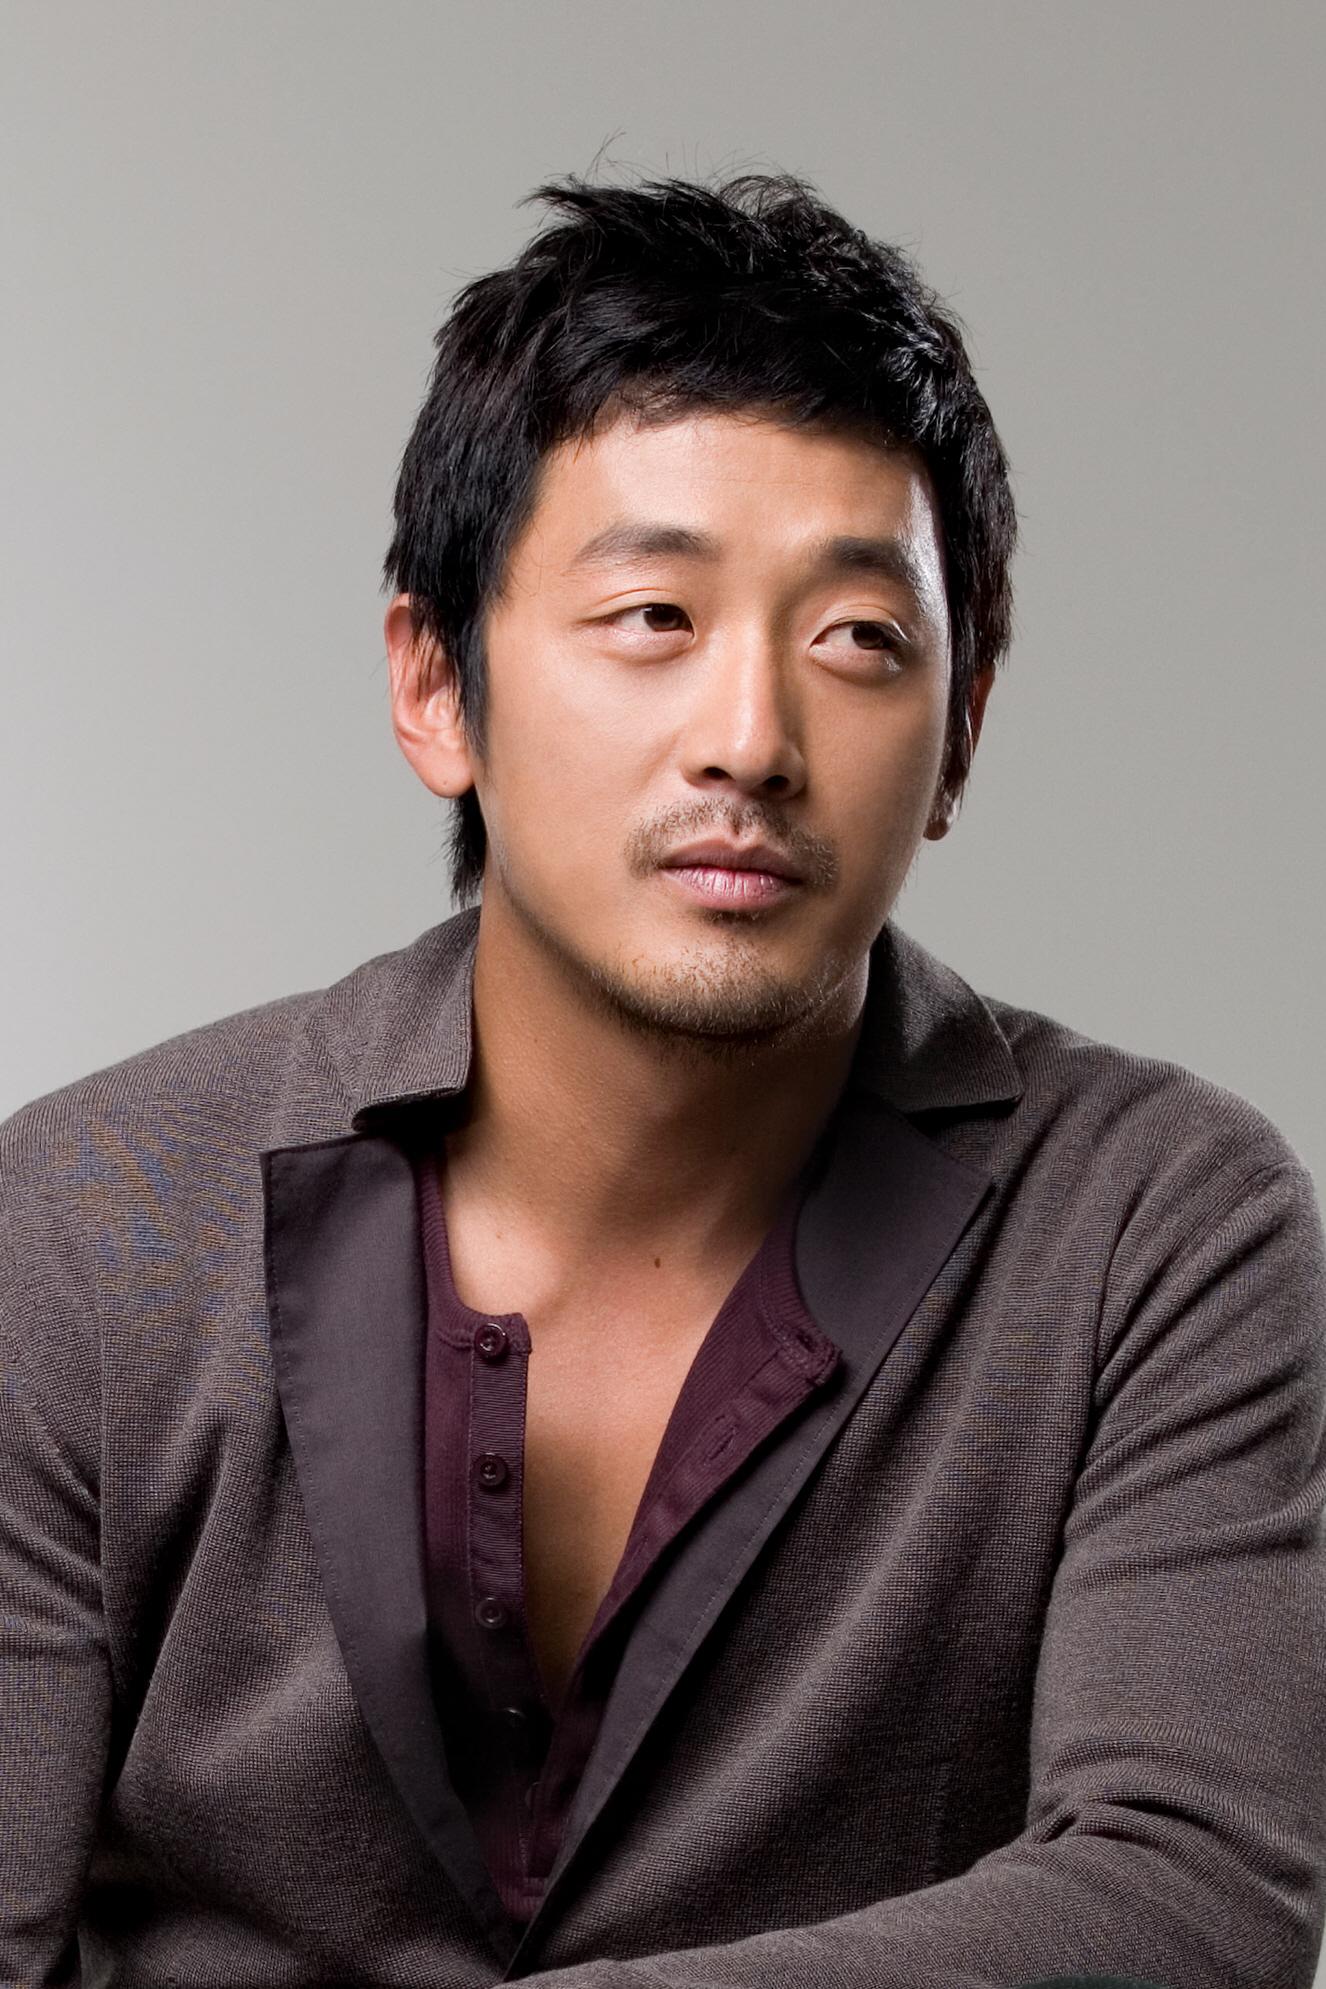 chronicle_of_a_blood_merchant_ha_jung-woo_www_innonews_kr.jpg